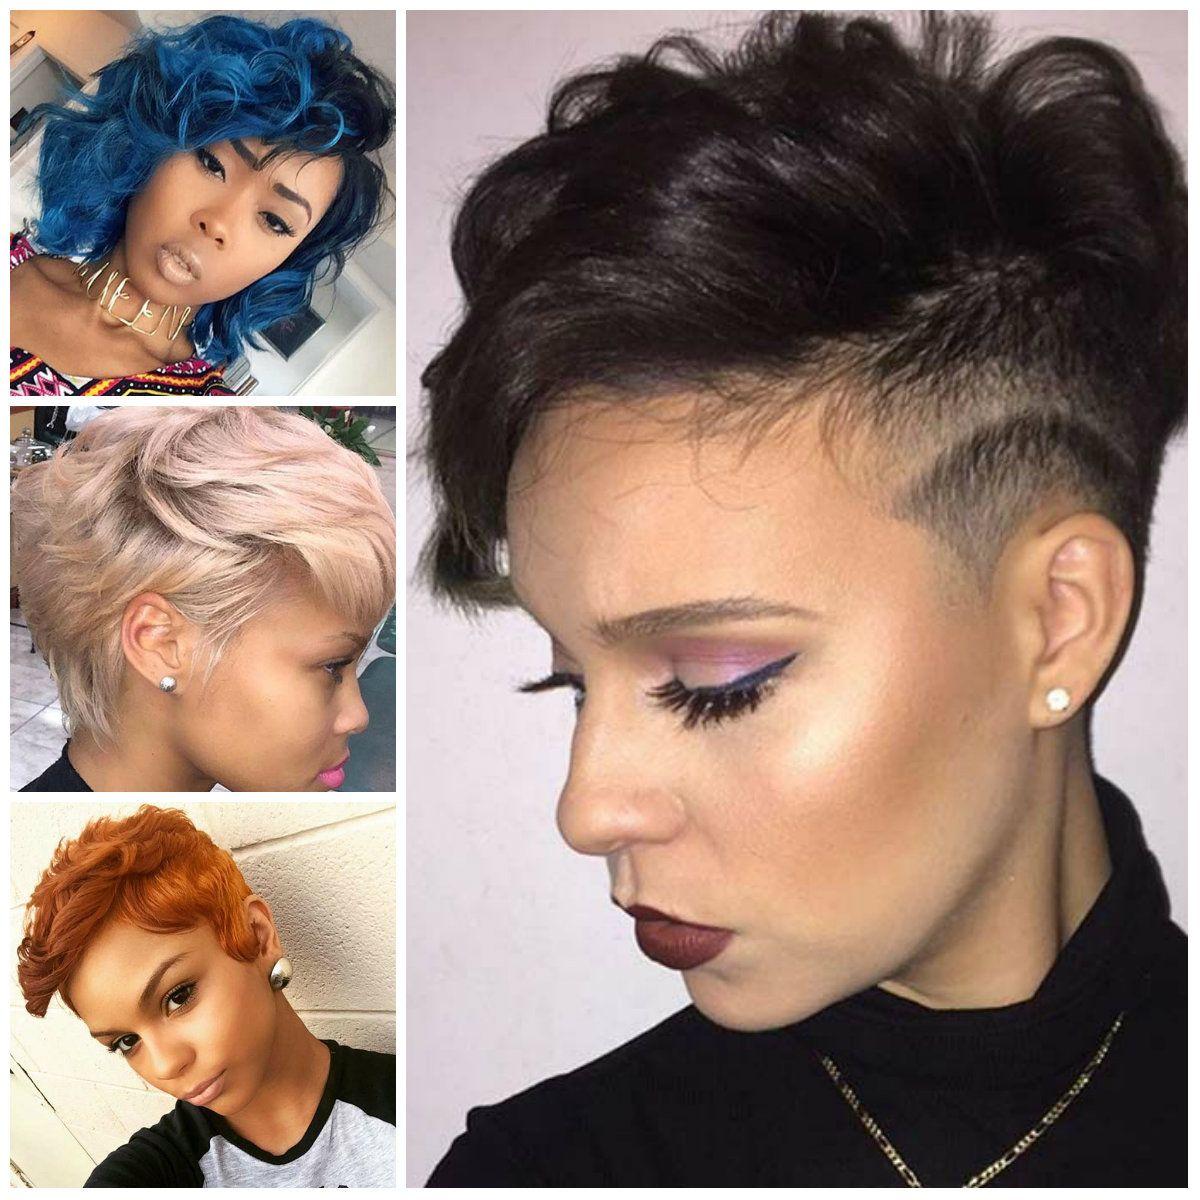 2017 super cortes de pelo corto | rachel hair, haircut 2017 and